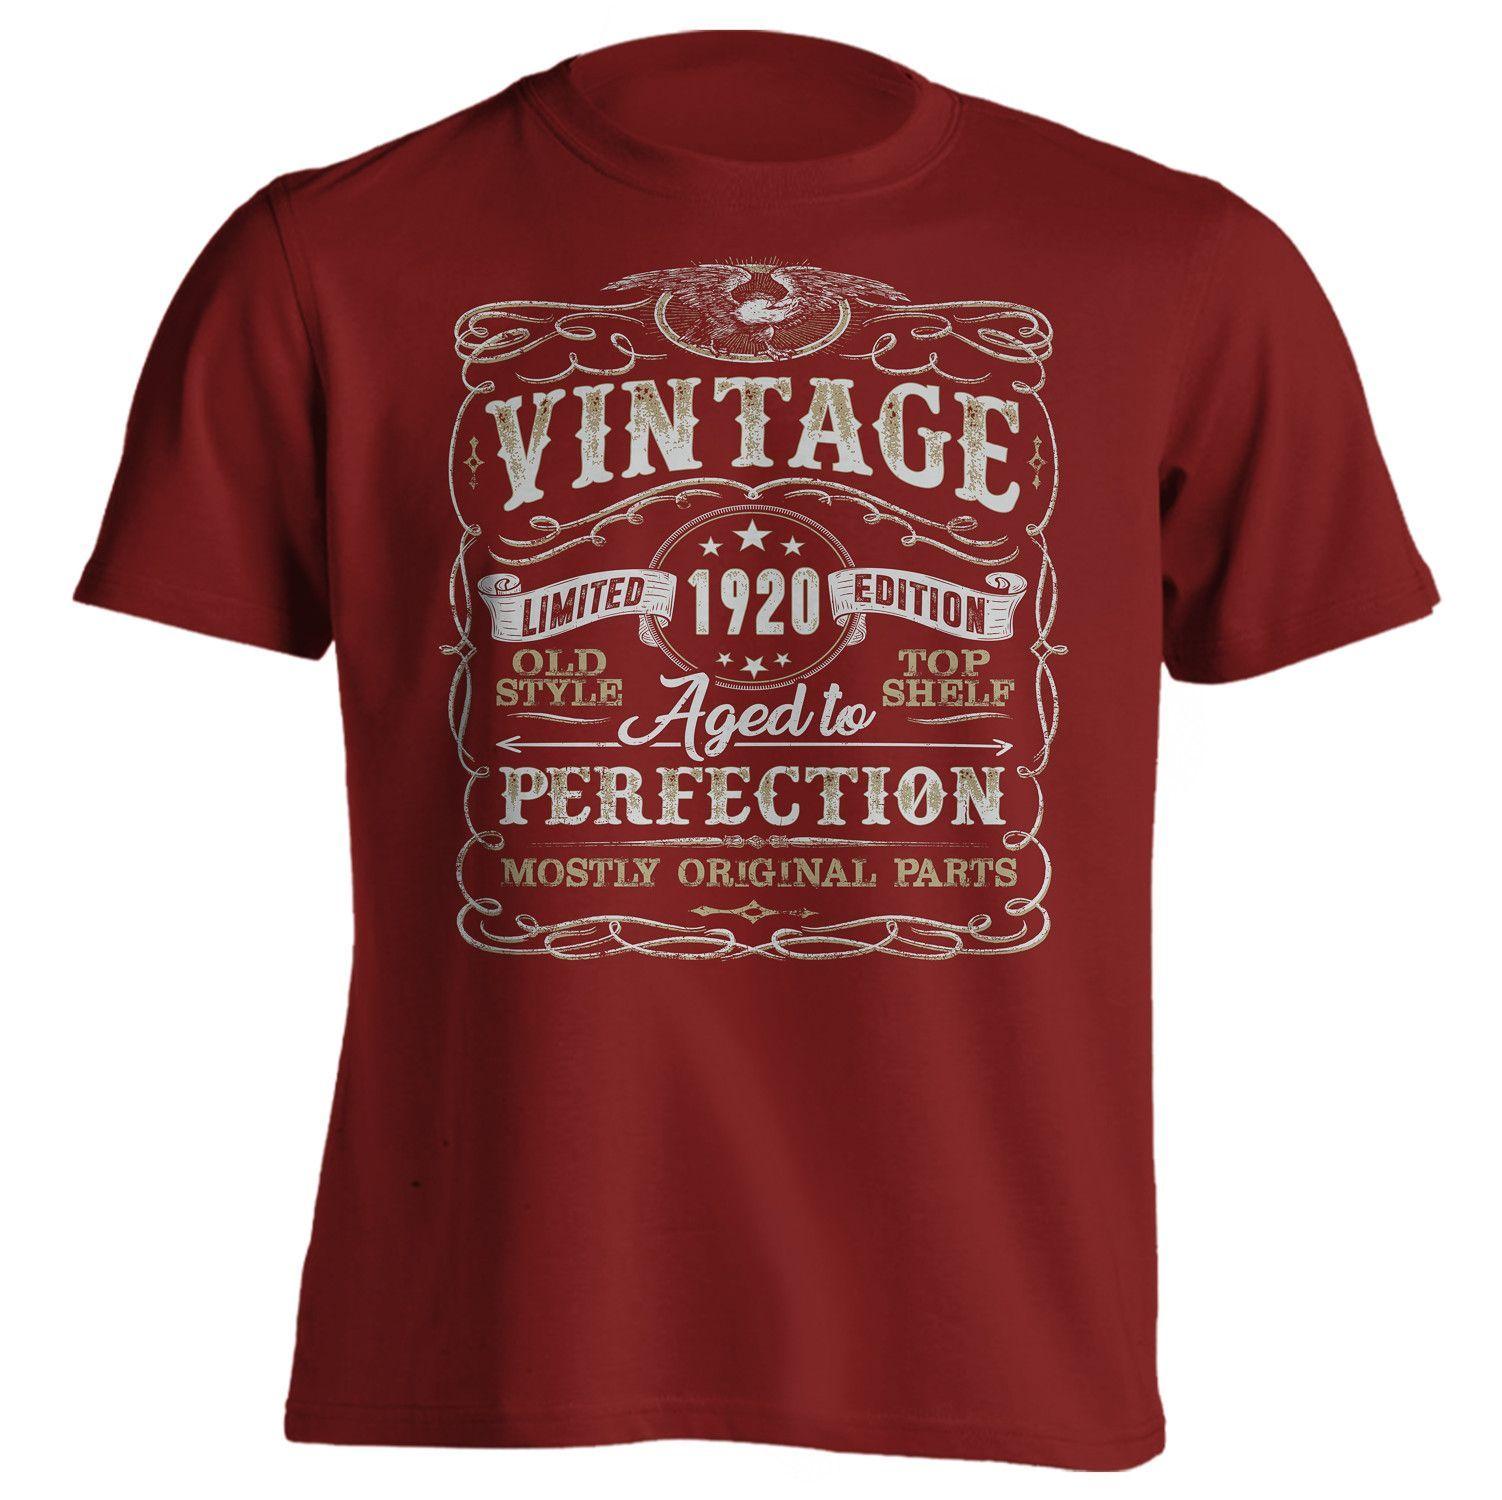 97th Birthday Shirt - Vintage - Mostly Original Parts